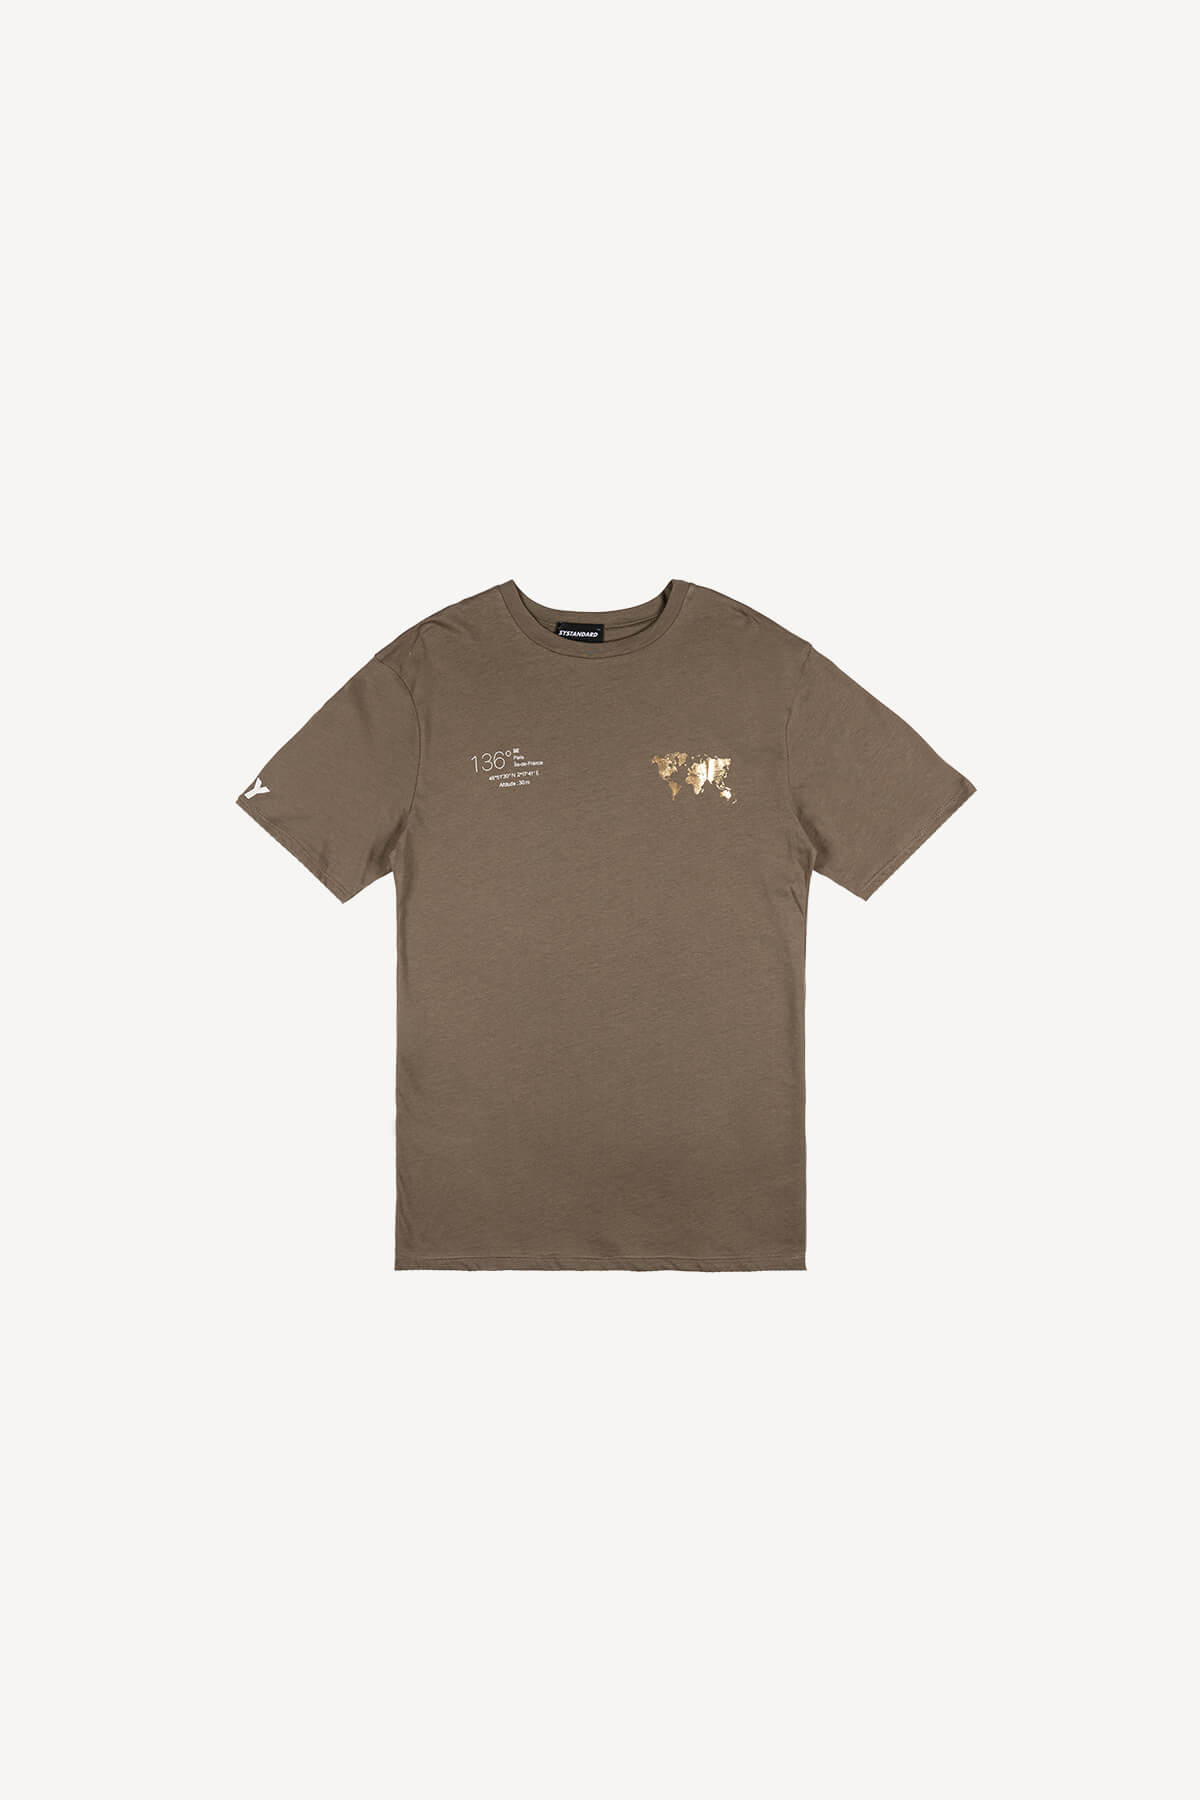 T-shirts Homme Kaki SYSTANDARD SYCO2288 #c eFashion Paris